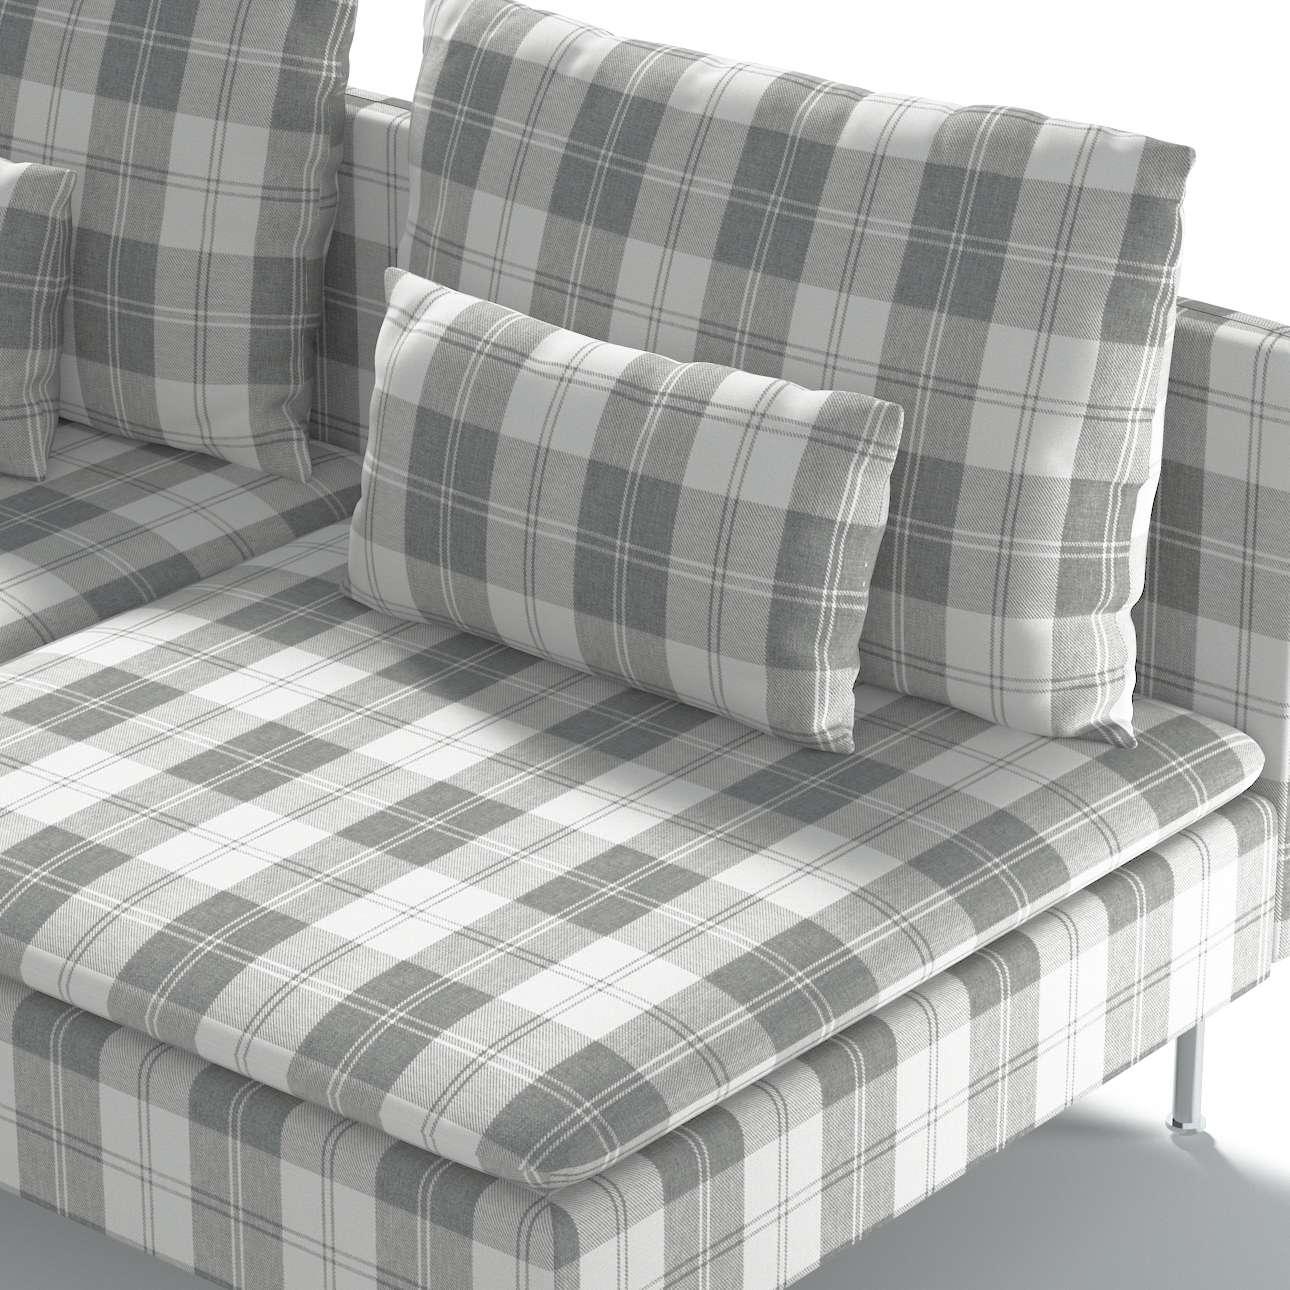 s derhamn bezug f r sitzelement 3 wei grau dekoria. Black Bedroom Furniture Sets. Home Design Ideas